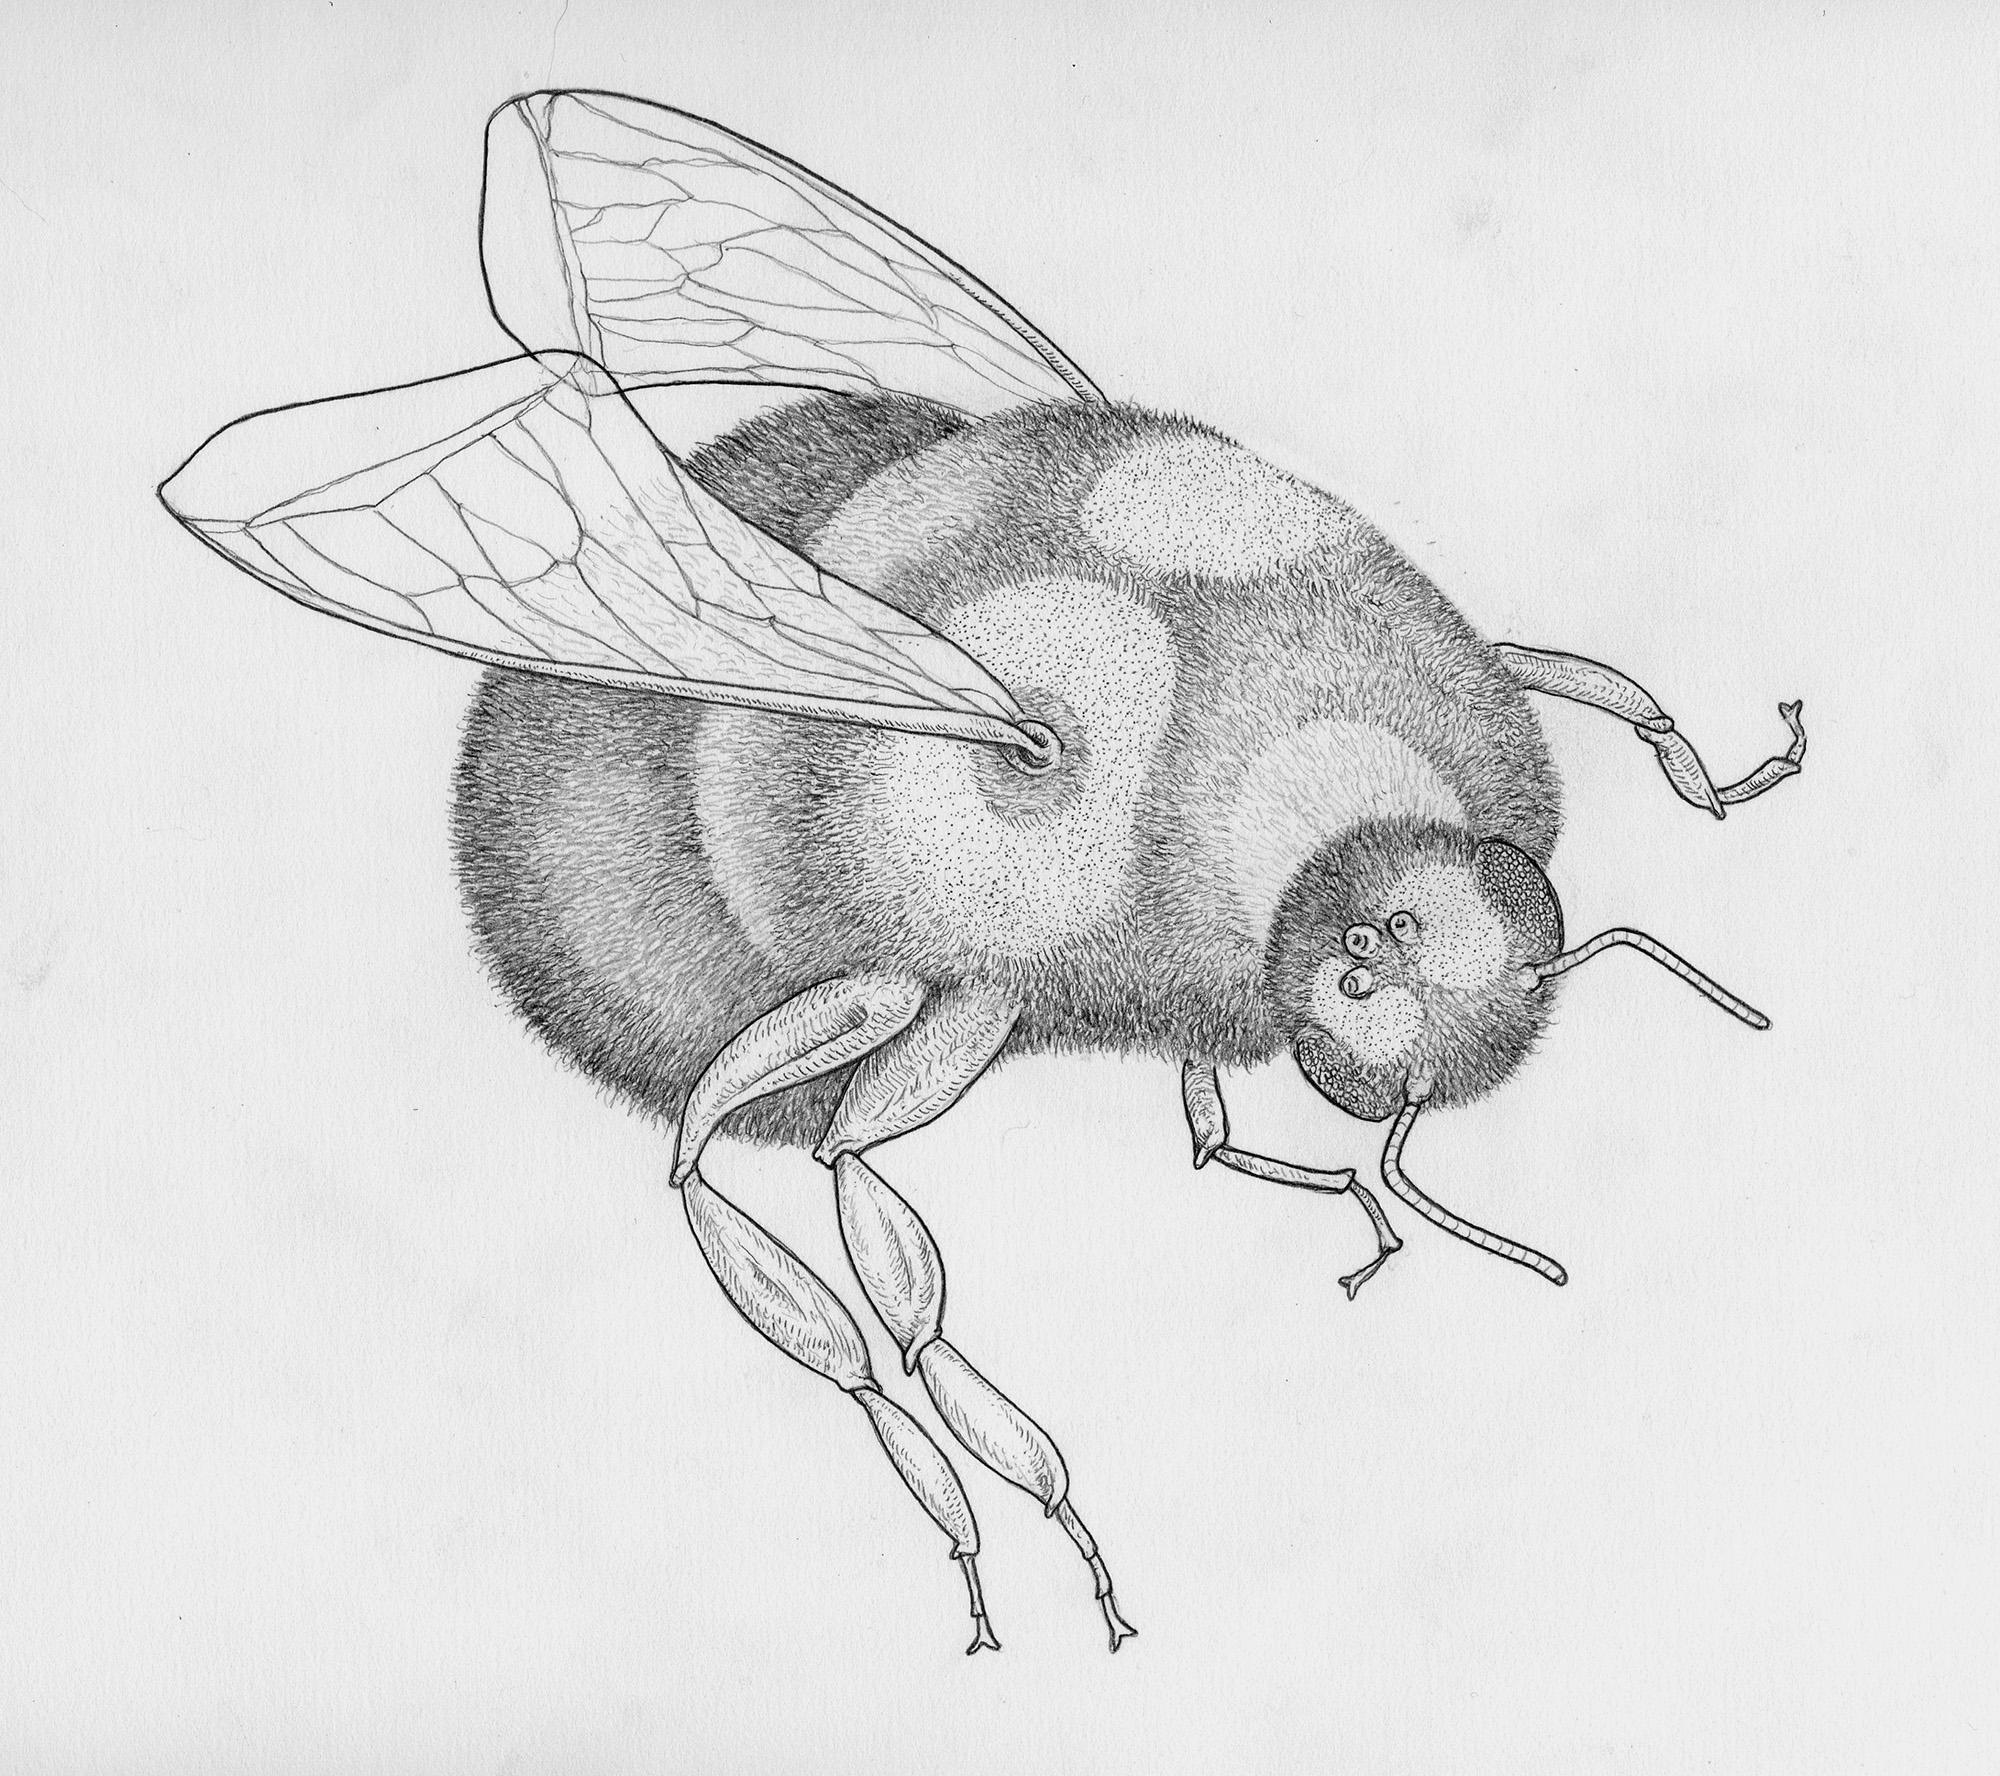 shaved-bee-2-graphite-web.jpg